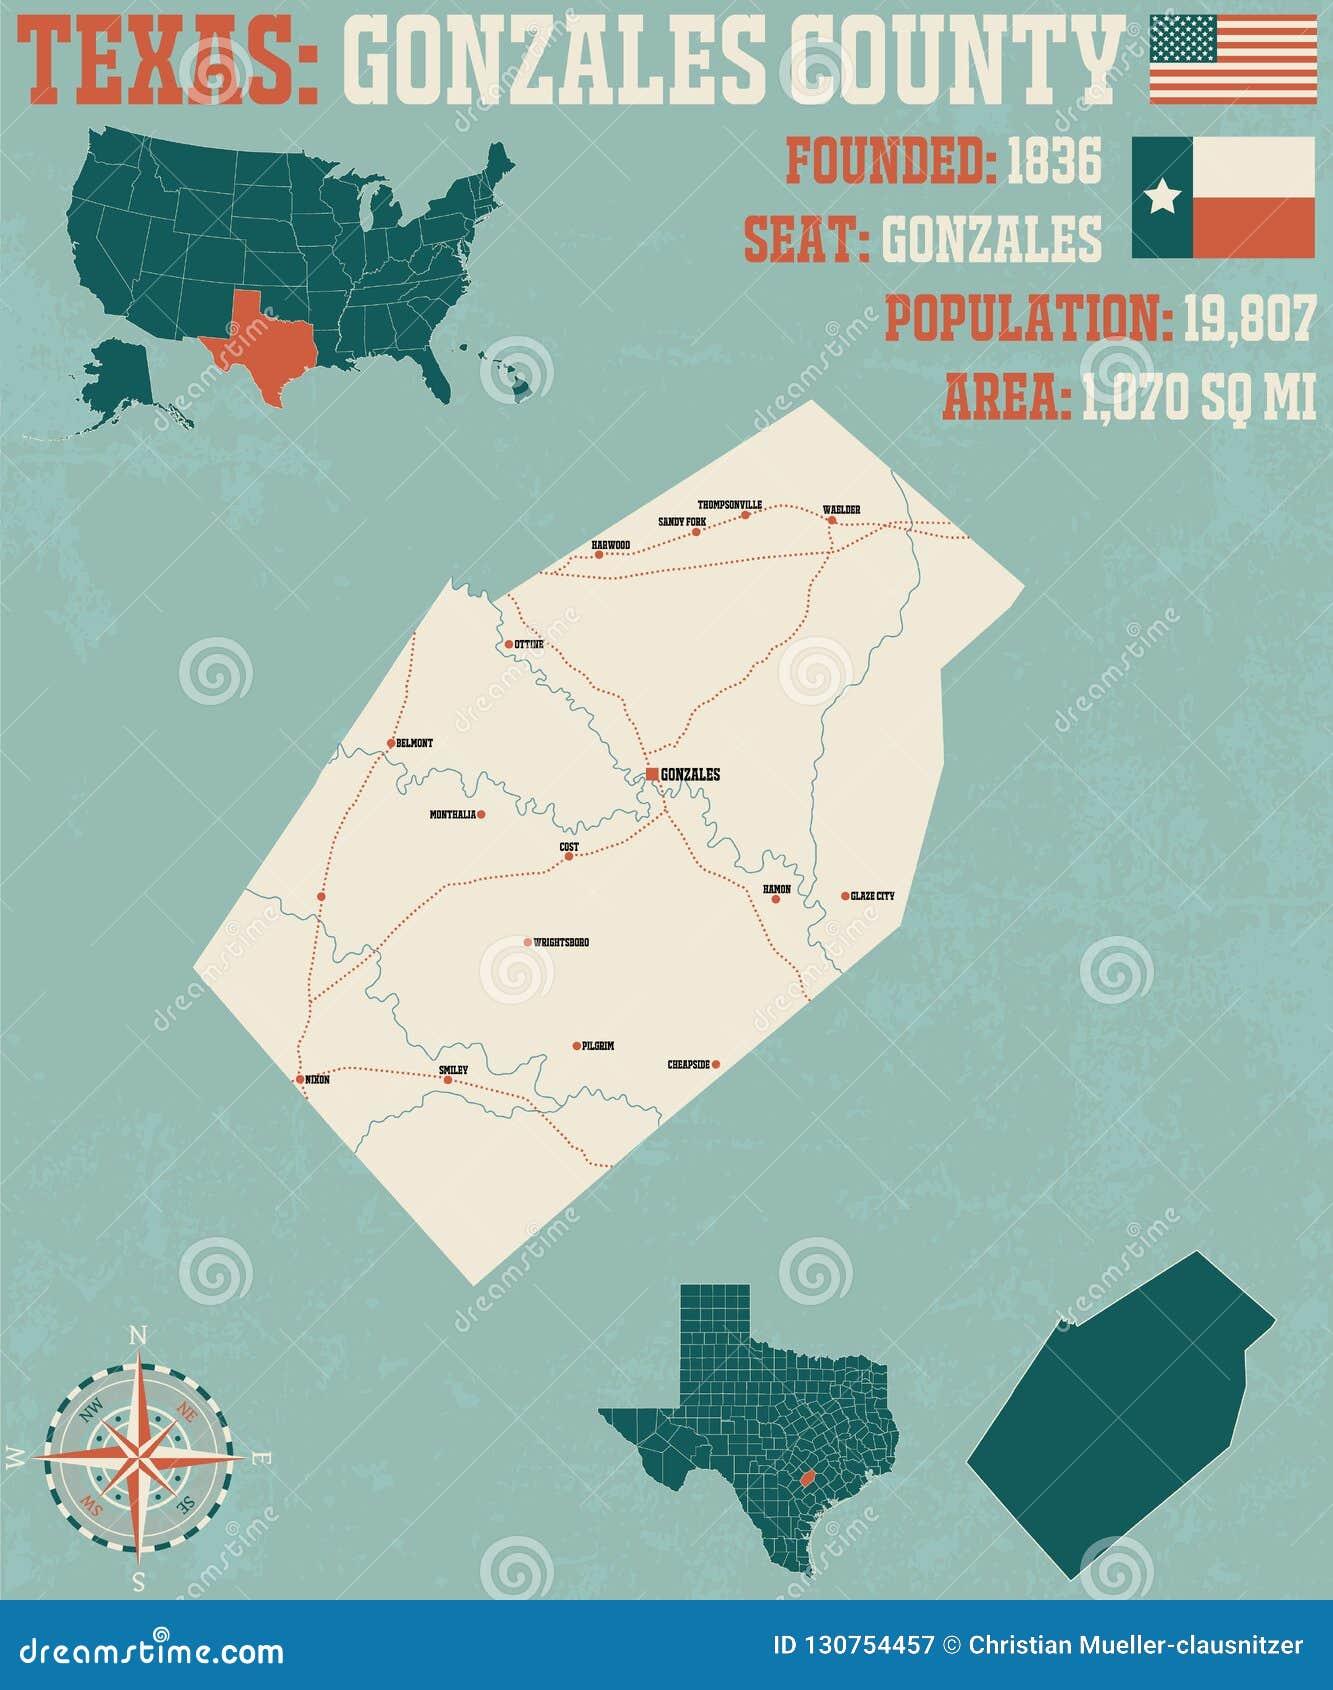 Map Of Gonzales County In Texas Stock Vector - Illustration ... Gonzales County Texas Map on rhome texas county map, brown county, caldwell county, marshall county texas map, colorado county, madisonville county texas map, collingsworth county texas map, dewitt county, brownwood county texas map, gonzales texas on a map, karnes county, colorado county texas map, gonzales texas aerial, lavaca county, zavala county, fayette county texas road map, harrison county texas map, fannin county, harris county, guadalupe county texas map, bryan county texas map, gonzales texas 2014, benton county texas map, adams county texas map, beaumont county texas map, bell county, wilson county, mclennan county, lavaca county texas map, kingsville county texas map, comal county, guadalupe county, jackson county, burnet county, san antonio county texas map, bexar county, pasadena county texas map,